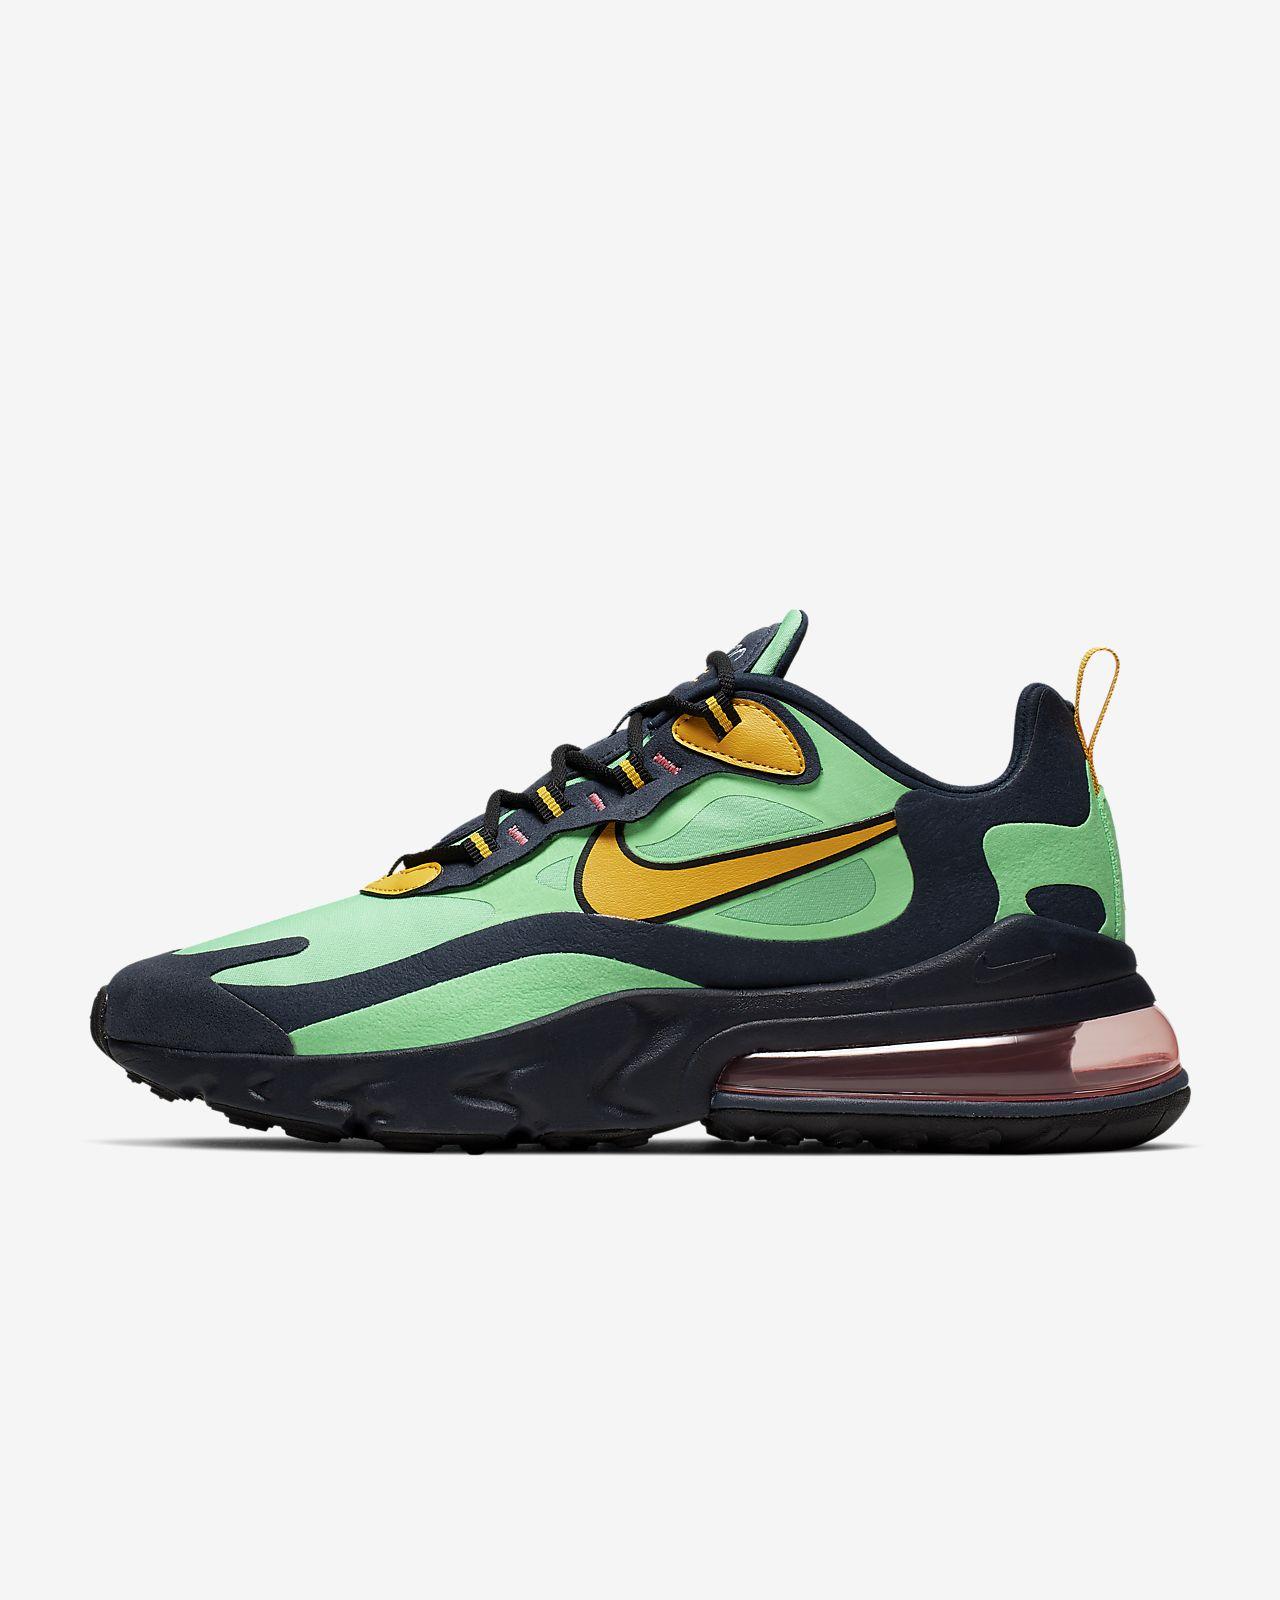 Chaussure Nike Air Max 270 React (Pop Art) pour Homme